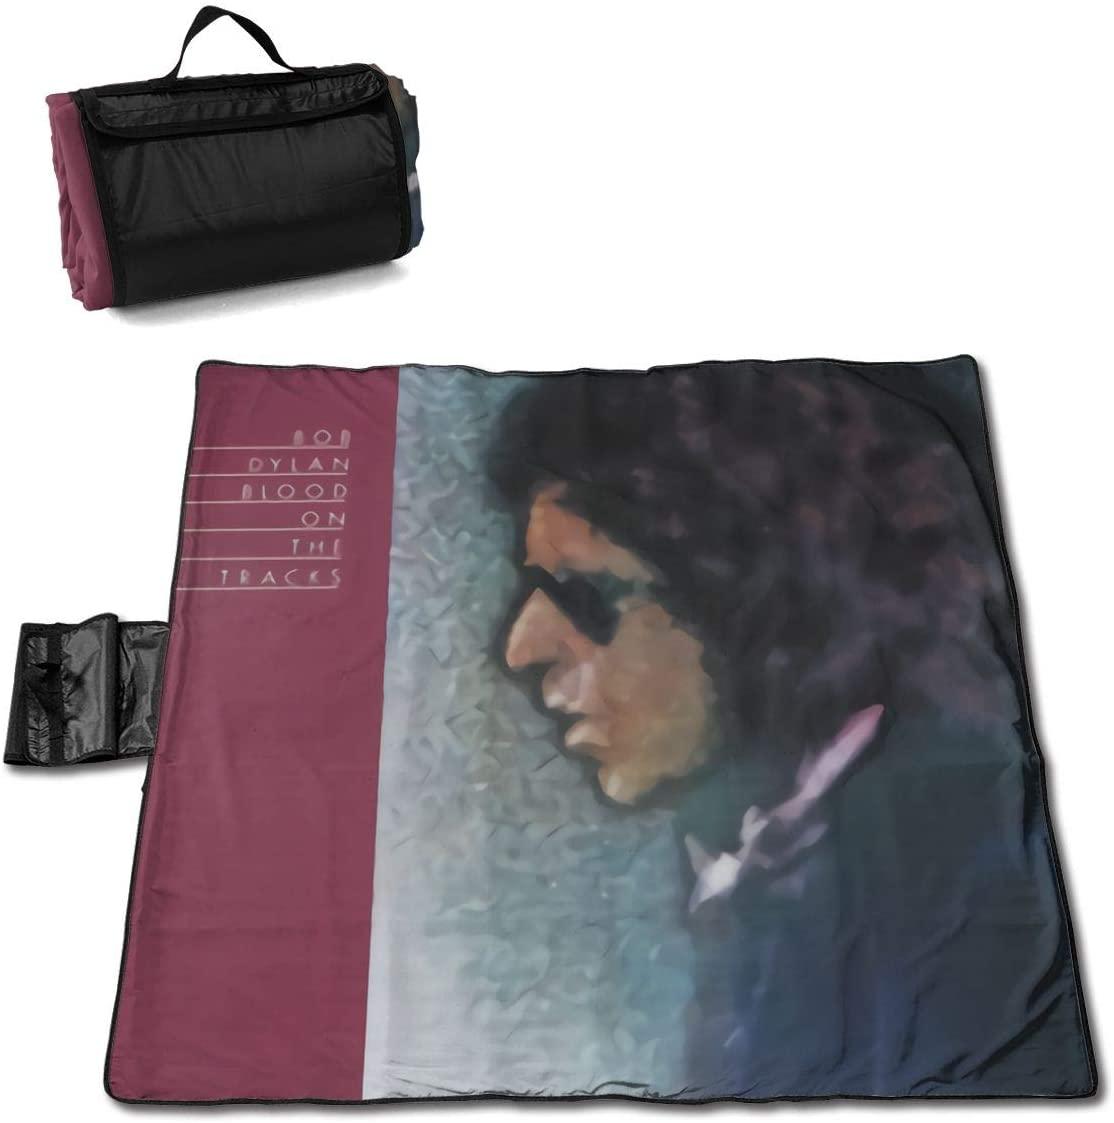 Fulu Bob Dylan Blood On The Tracks Portable Printed Picnic Blanket Waterproof 59x57(in)